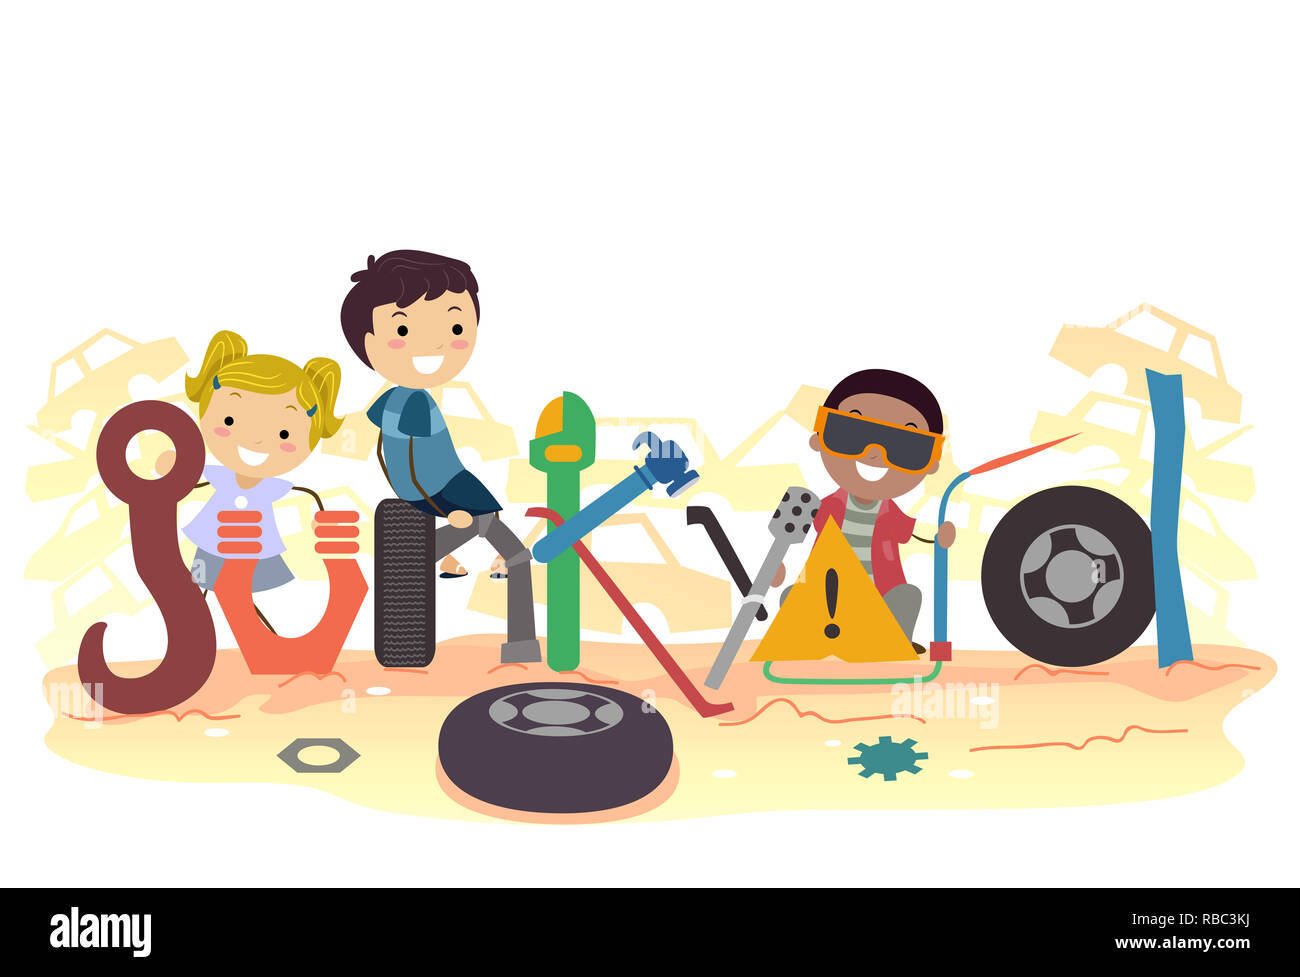 Illustration of Stickman Kids among Junk with Junkyard Lettering - Stock Image